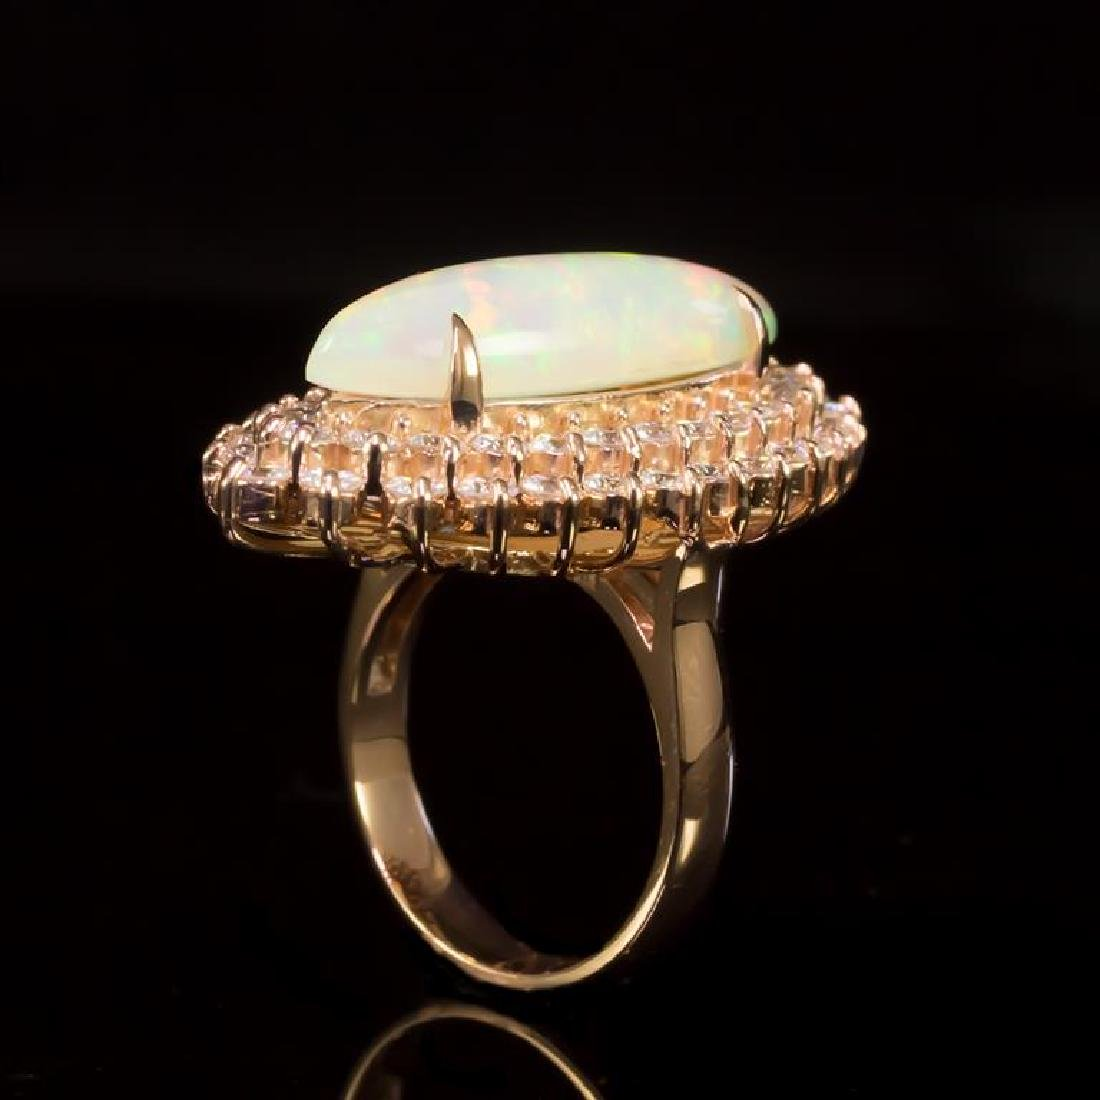 14K Gold 5,33ct Opal 2.85ct Diamond Ring - 3